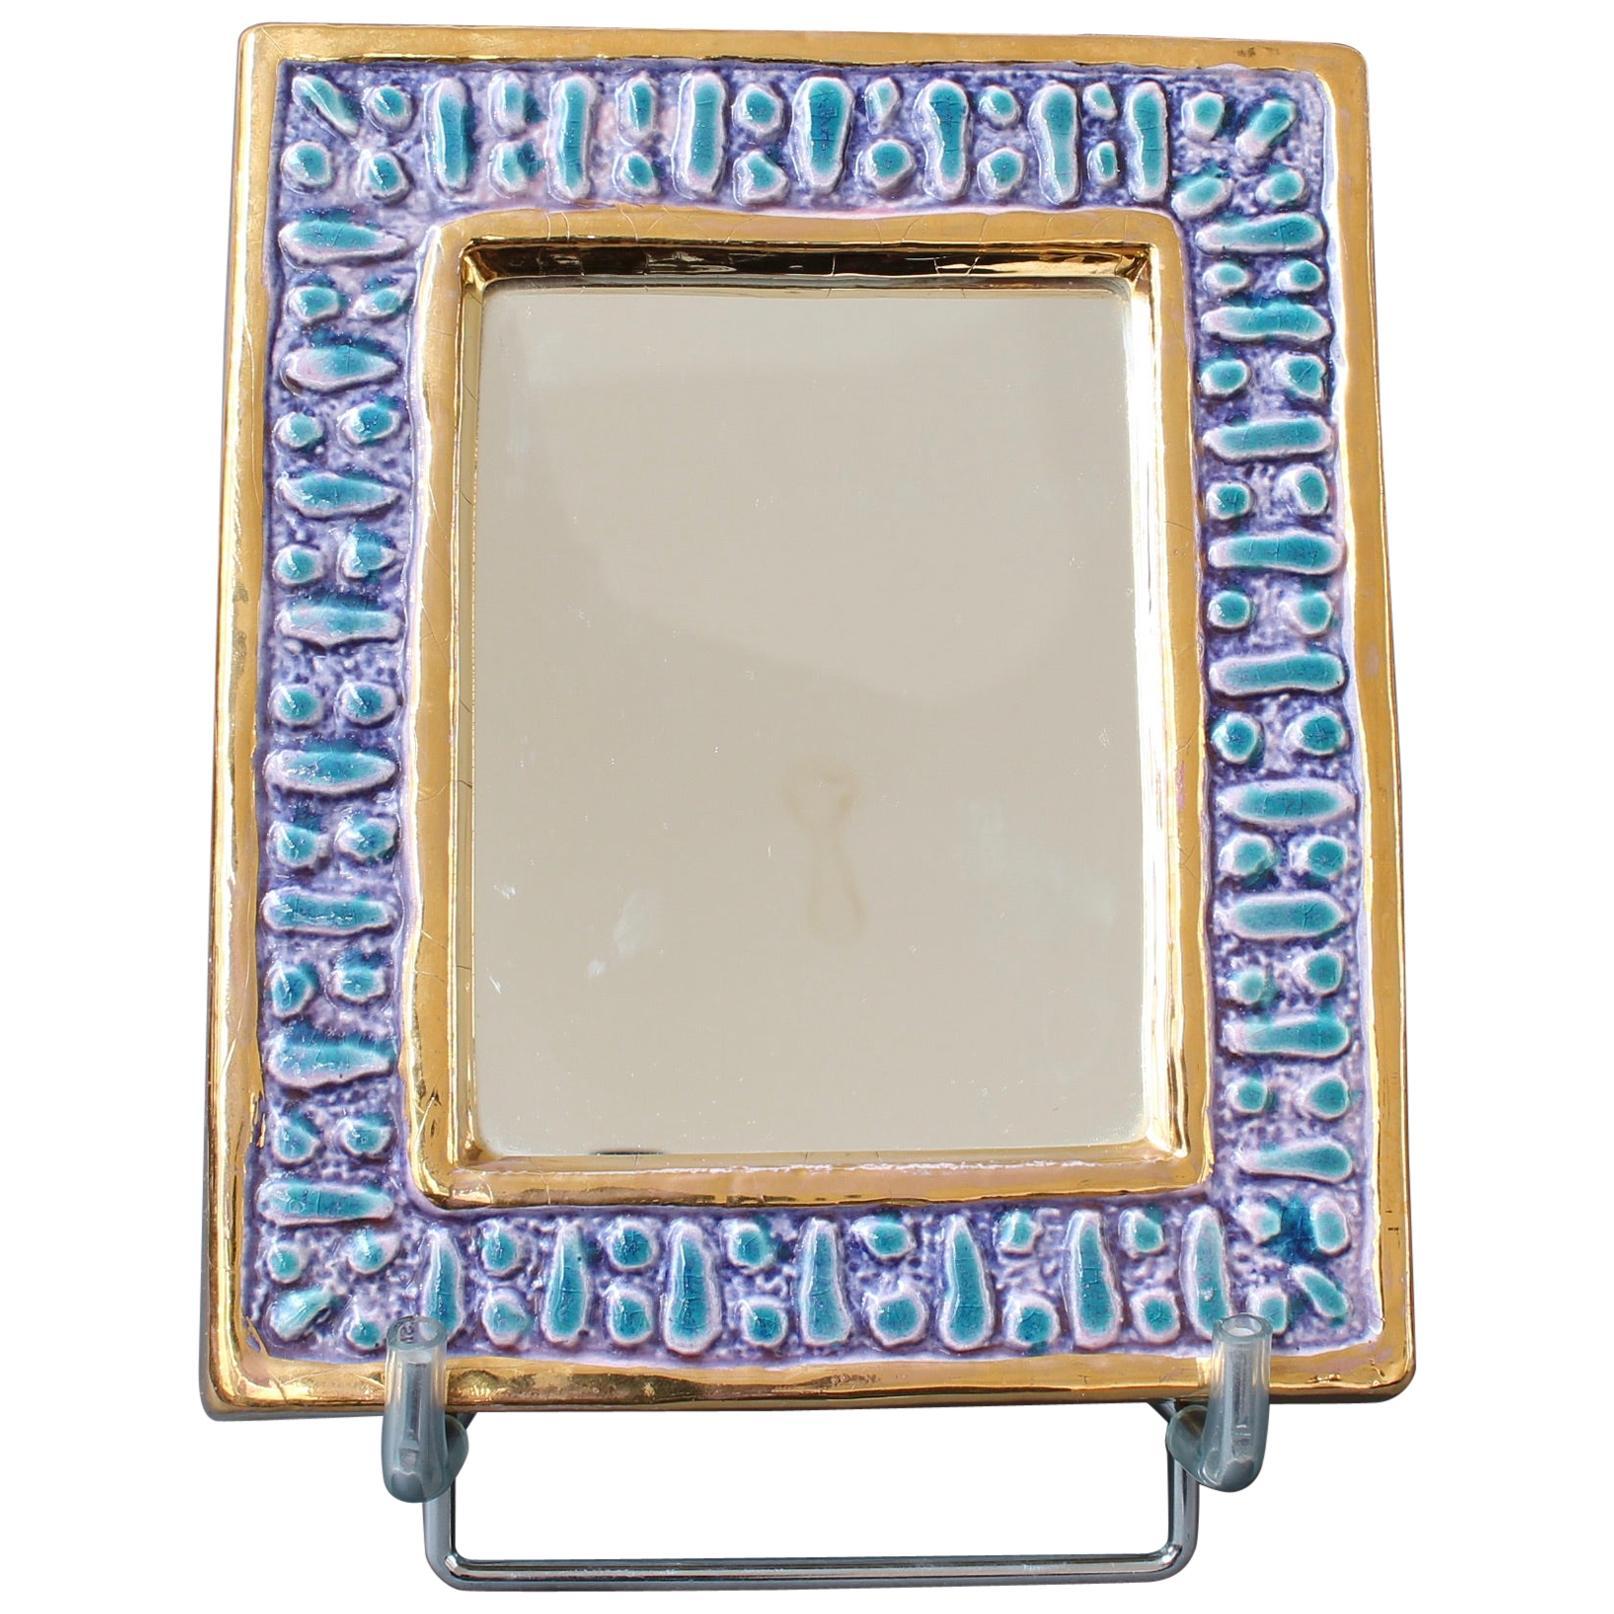 Ceramic Wall Mirror with Enamel Glaze Attributed to François Lembo, circa 1970s